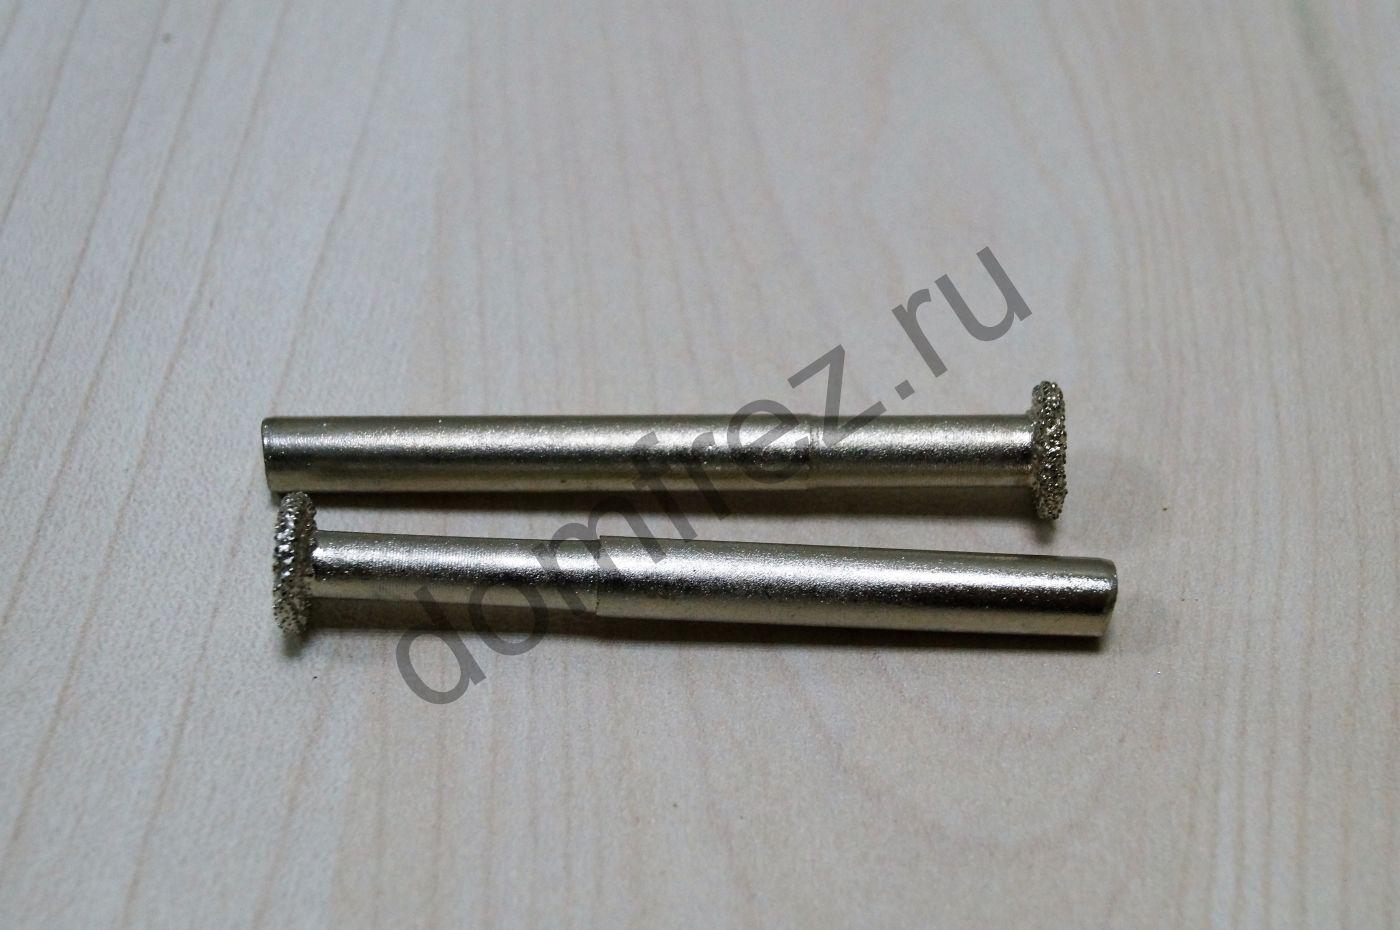 Фреза алмазная концевая фасонная №8 6x10x60 A8910608